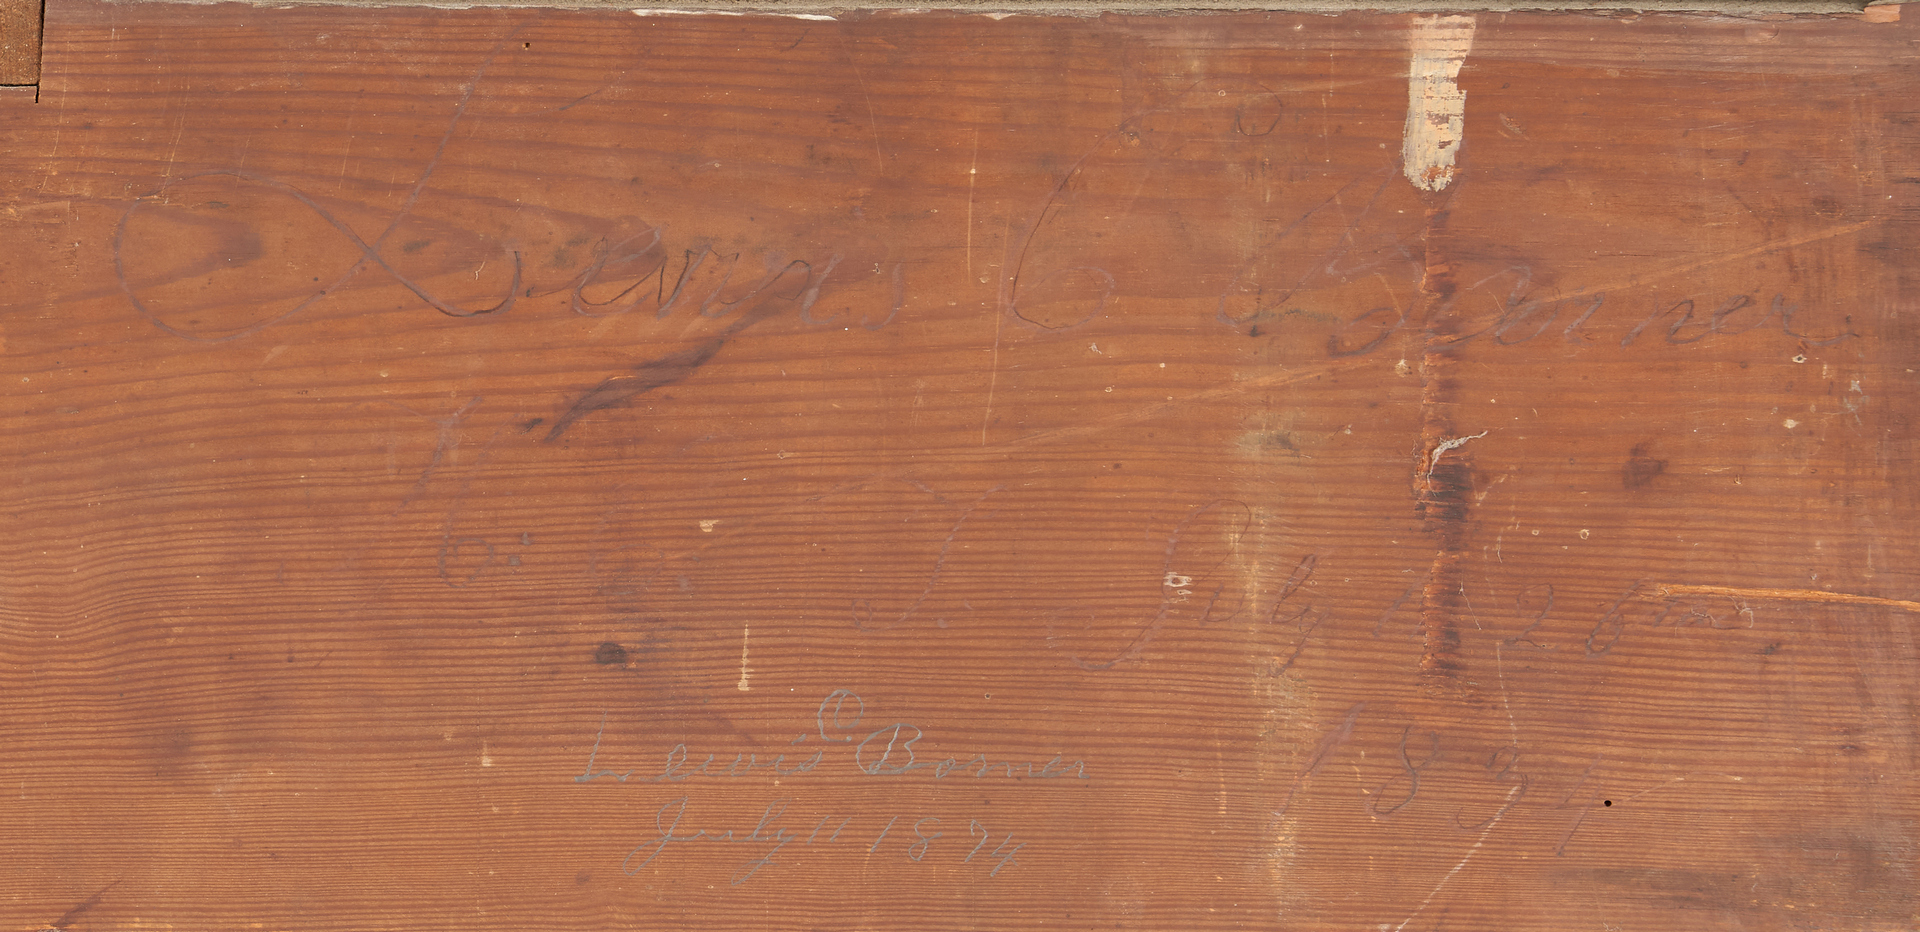 Lot 174: East TN Walnut Jackson Press, Signed Banner 1834